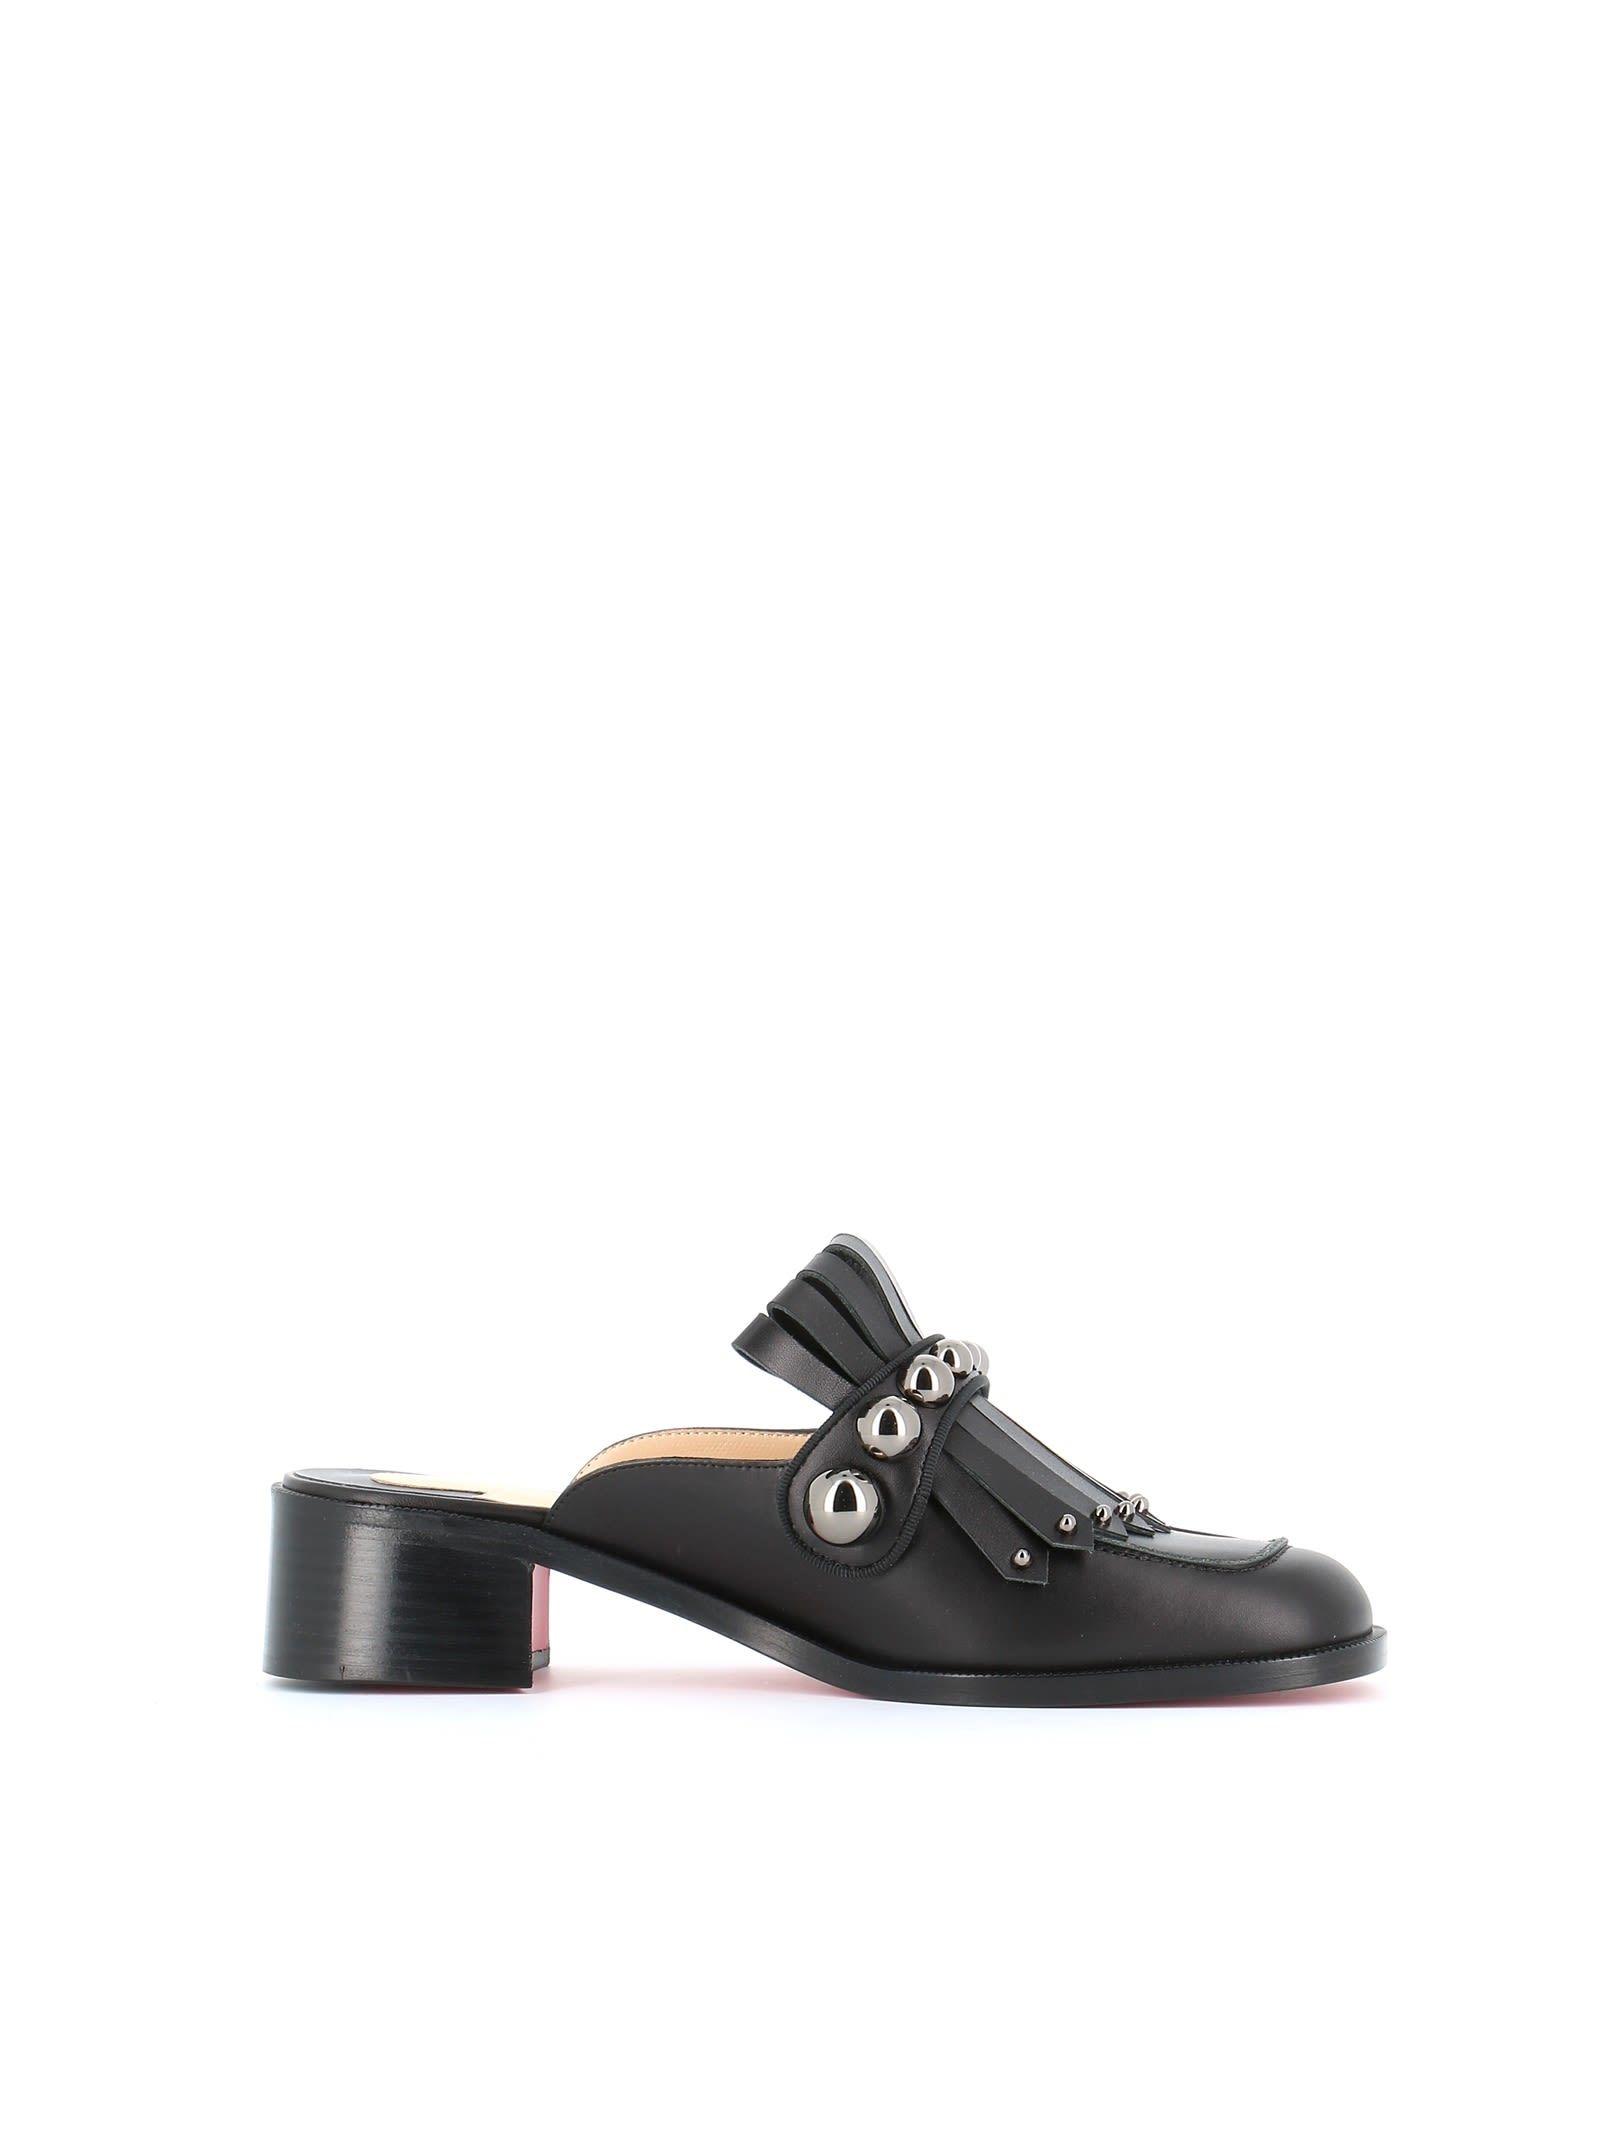 bc1d36d964b8 CHRISTIAN LOUBOUTIN OCTAVIAN MULA 35 SLIP-OP.  christianlouboutin  shoes